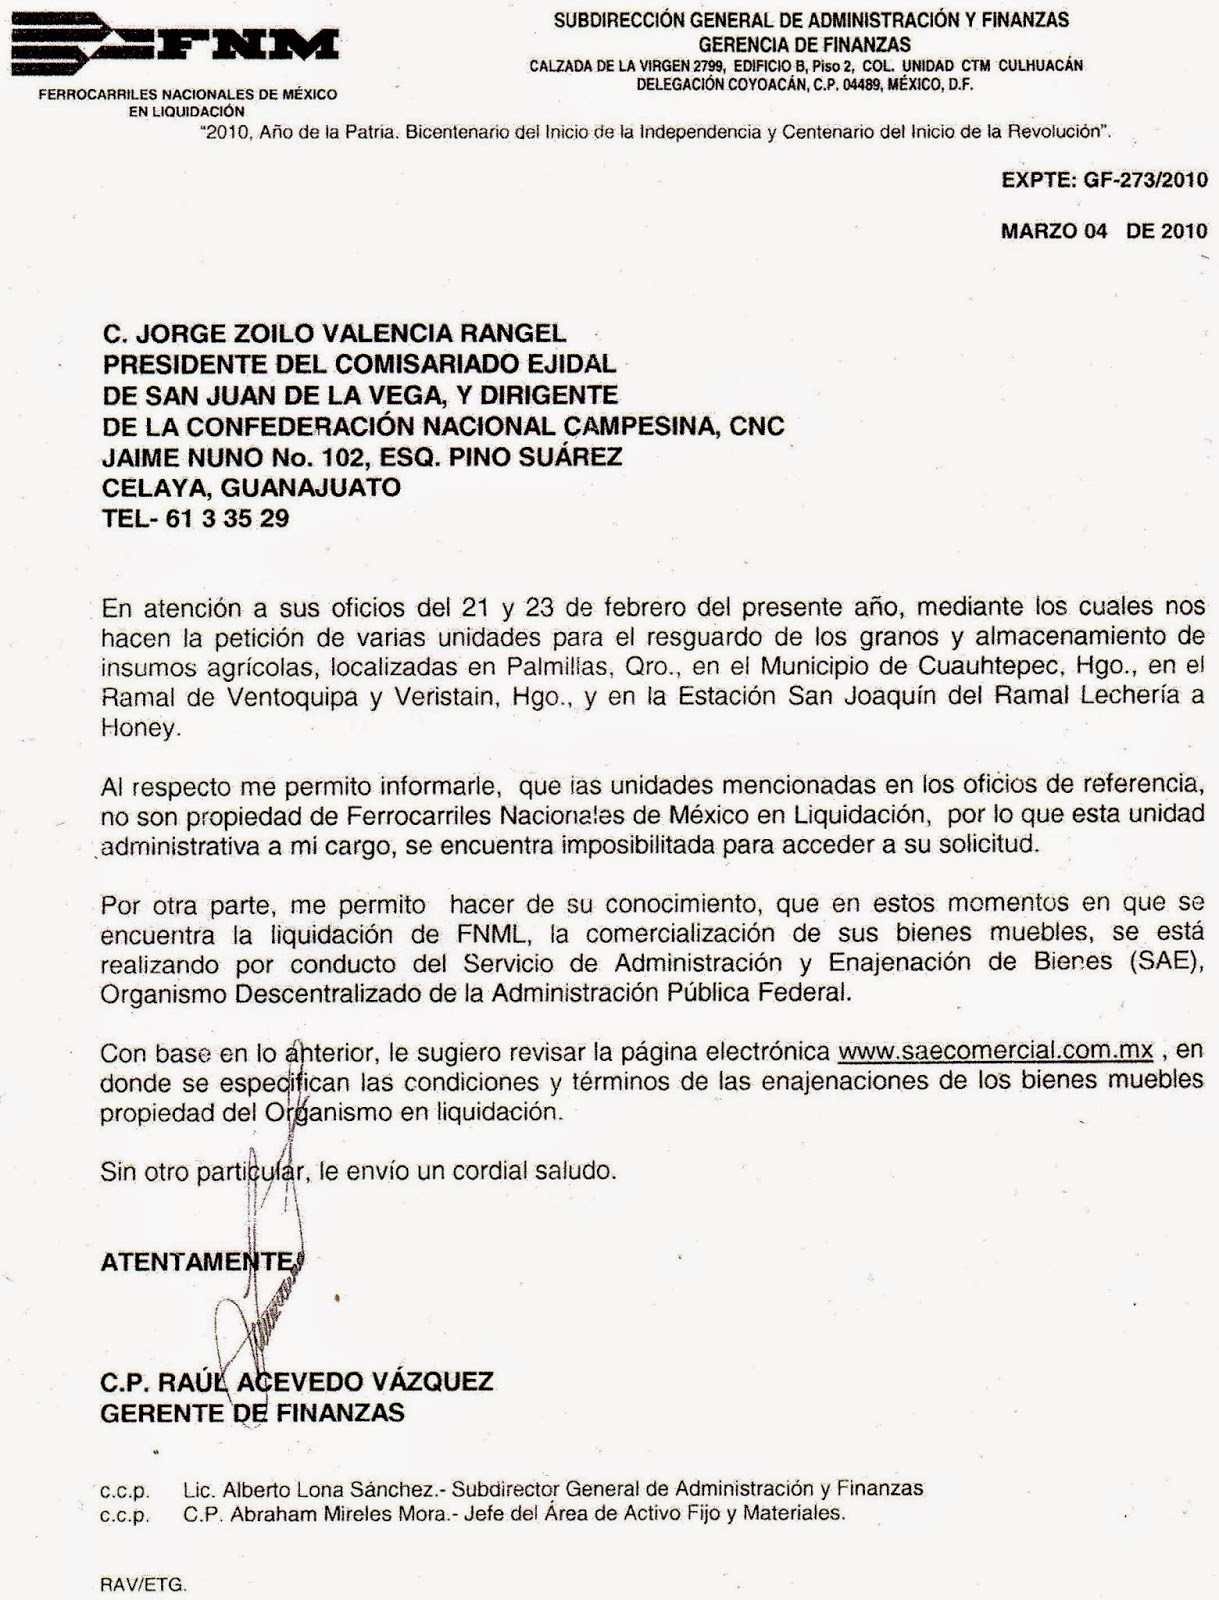 P R D Tulancingo # Muebles Rangel Guanajuato